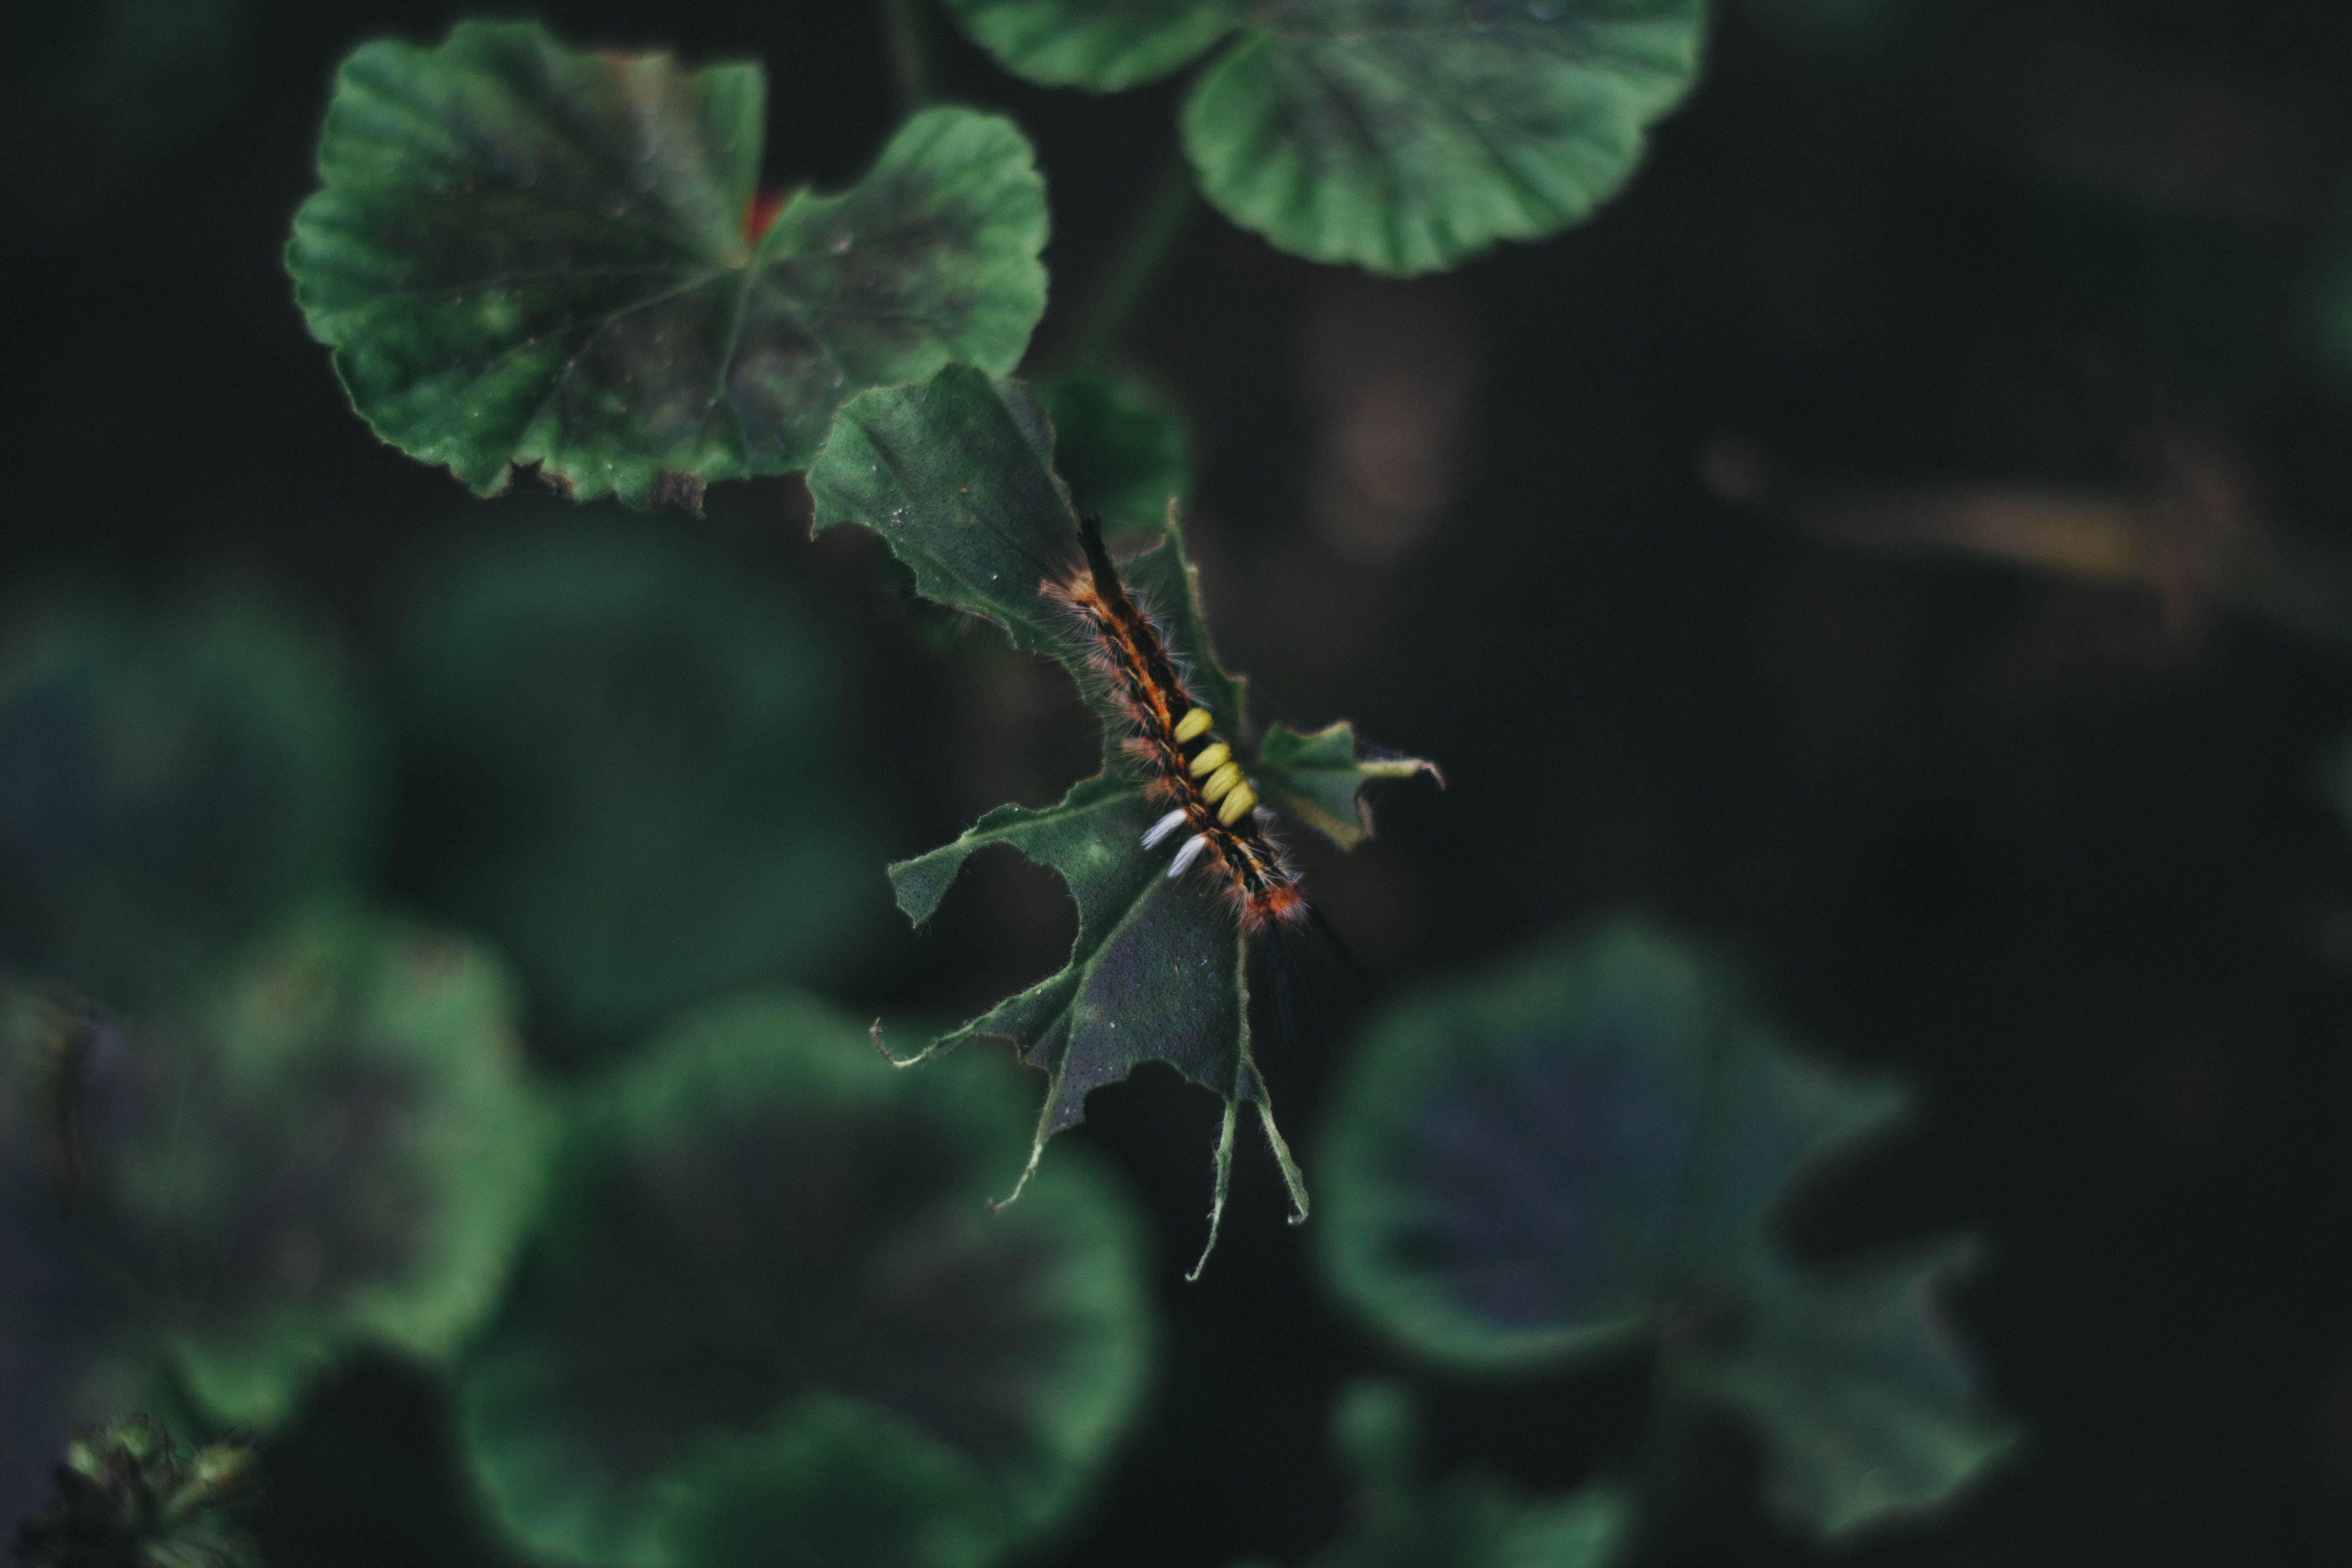 Close-Up Photo of Caterpillar On Leaf